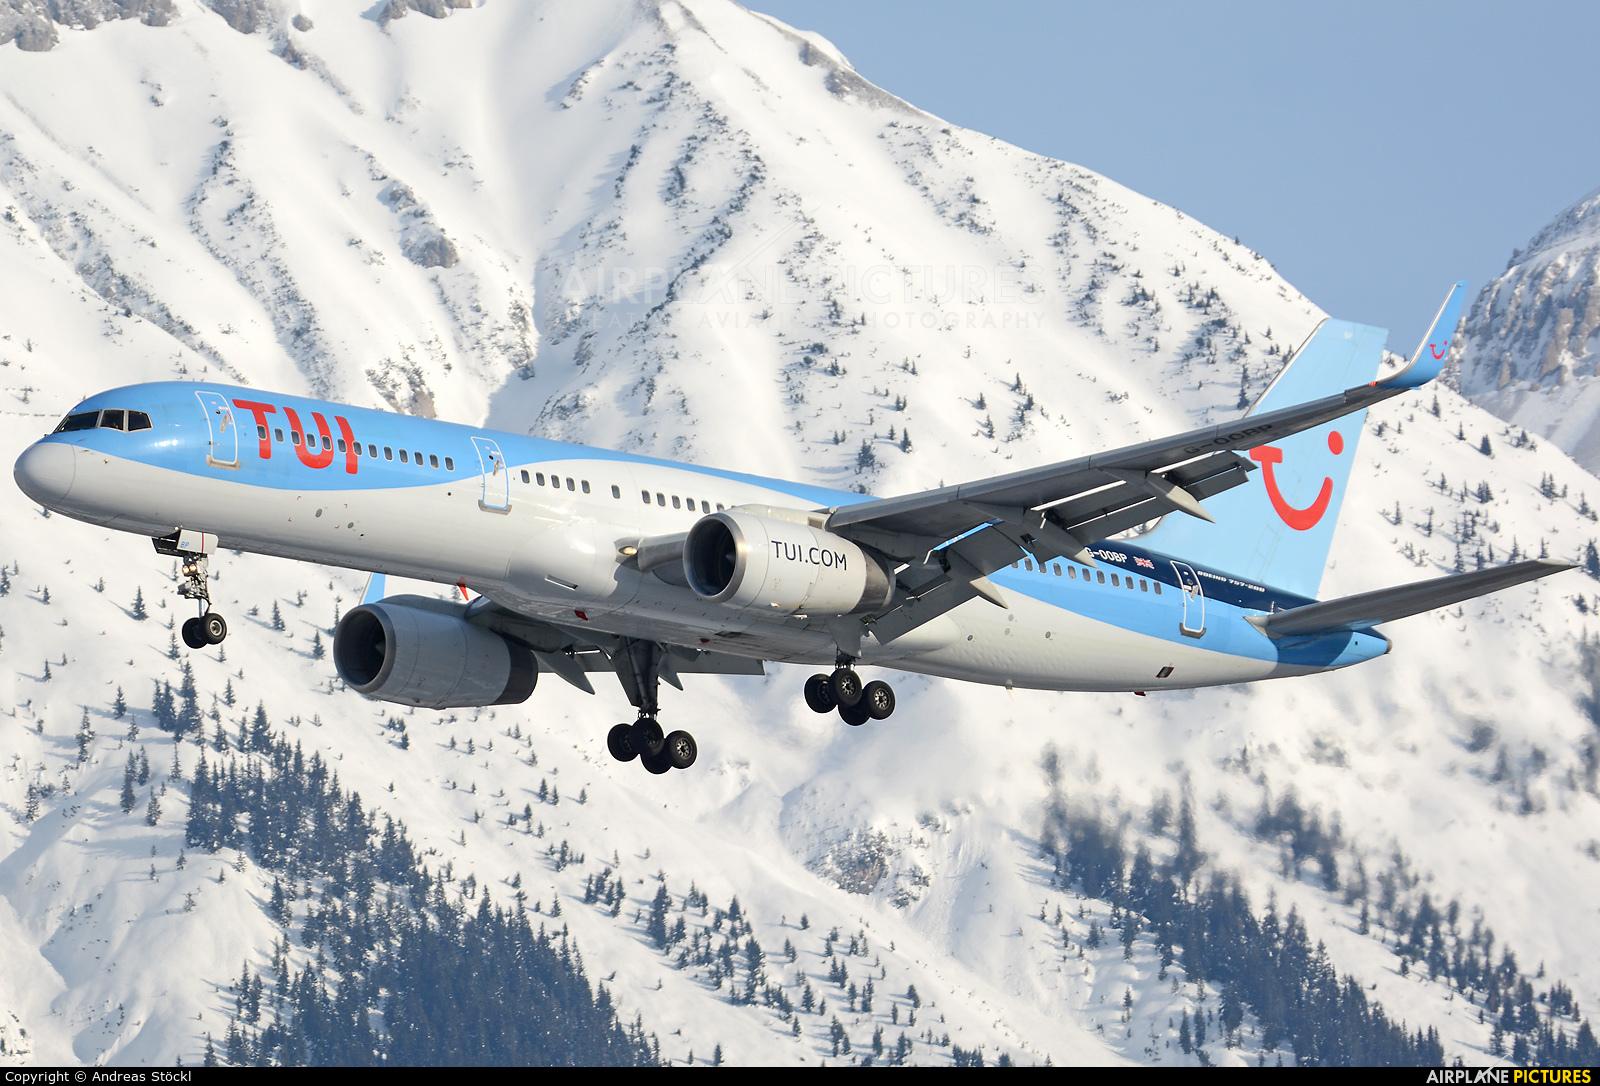 TUI Airways G-OOBP aircraft at Innsbruck